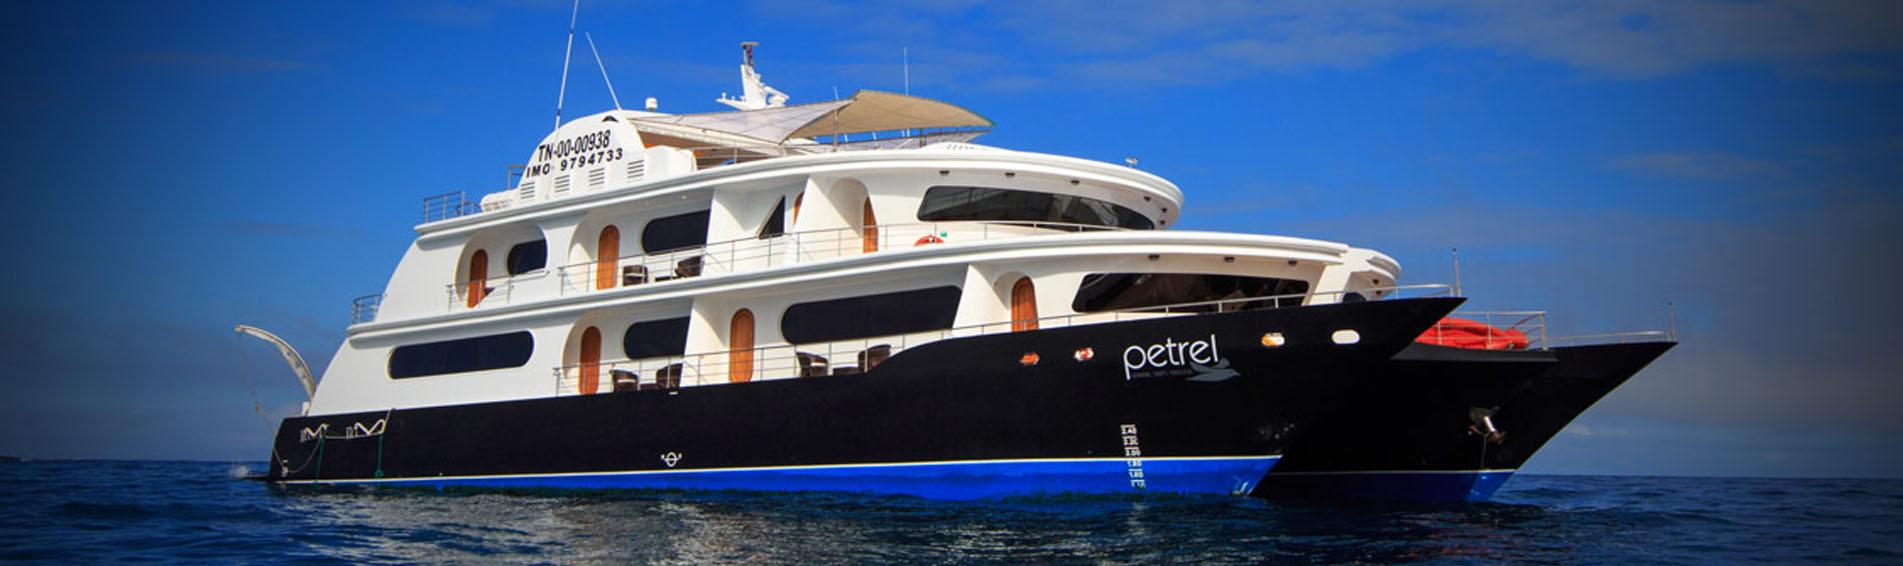 PETREL galapagos cruises hero photo